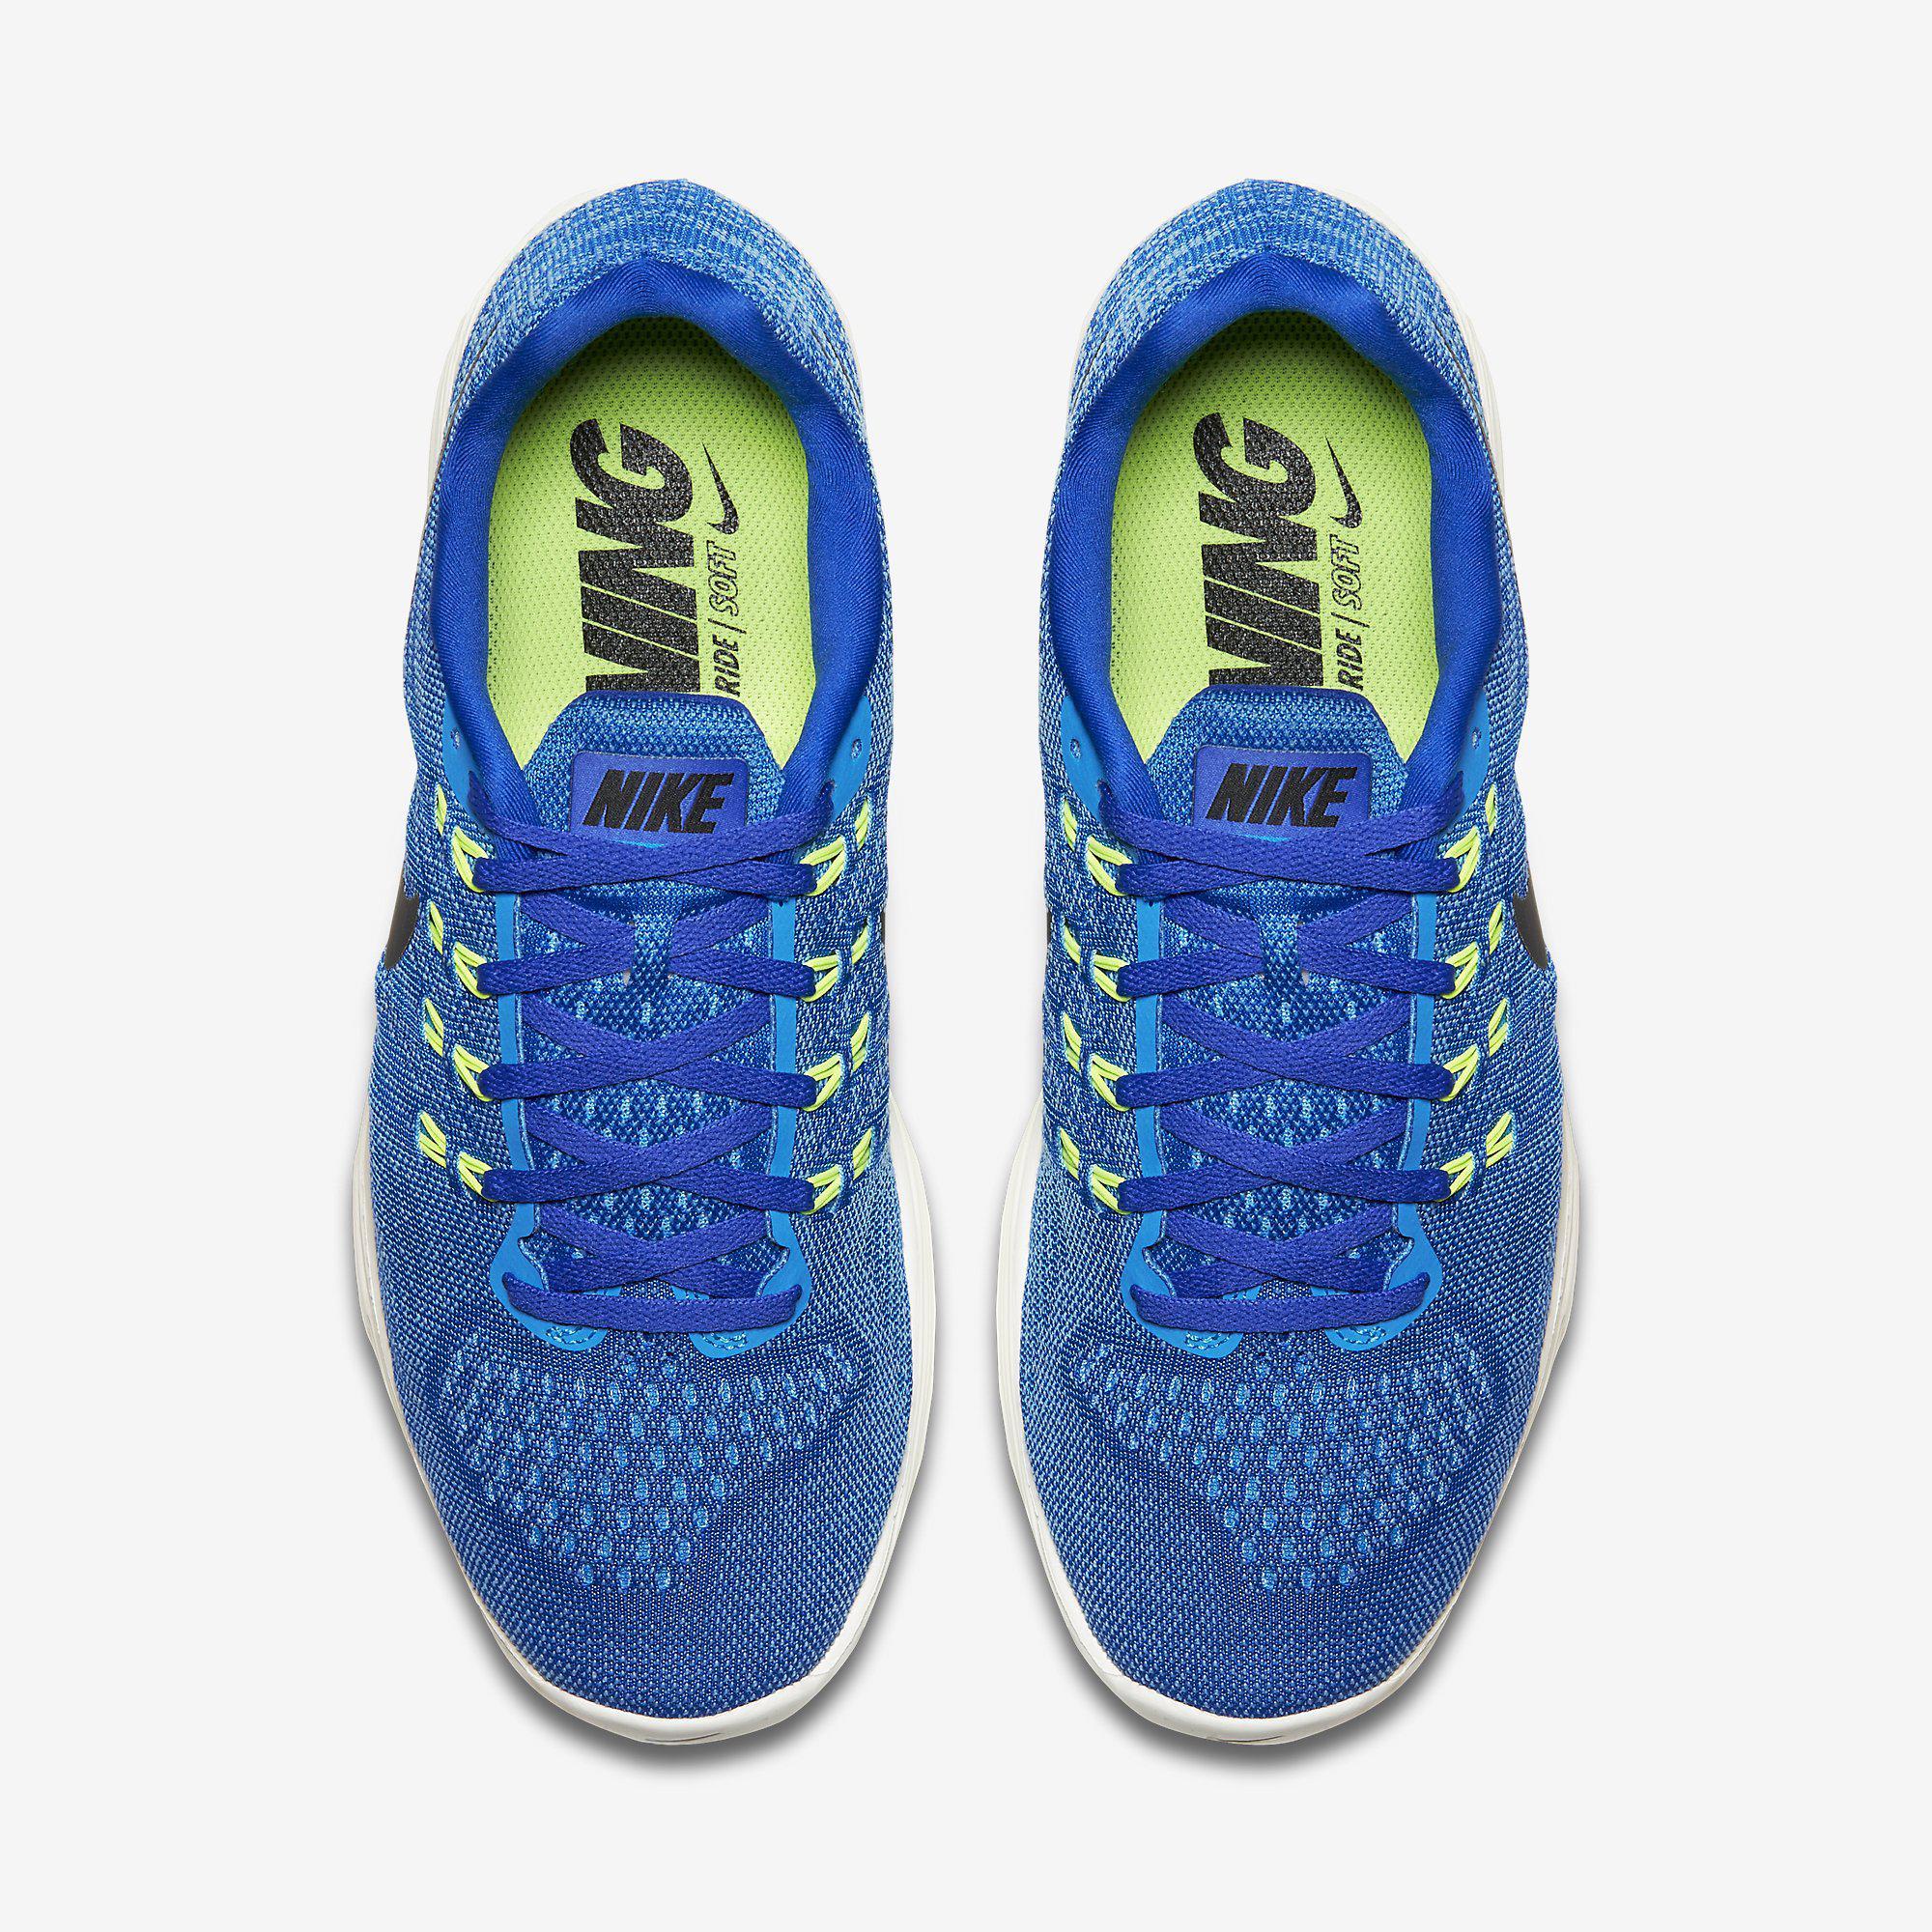 ... closeout nike mens lunartempo 2 running shoes racer blue 1f6ca 2b4d6 ... bb8862f00ead